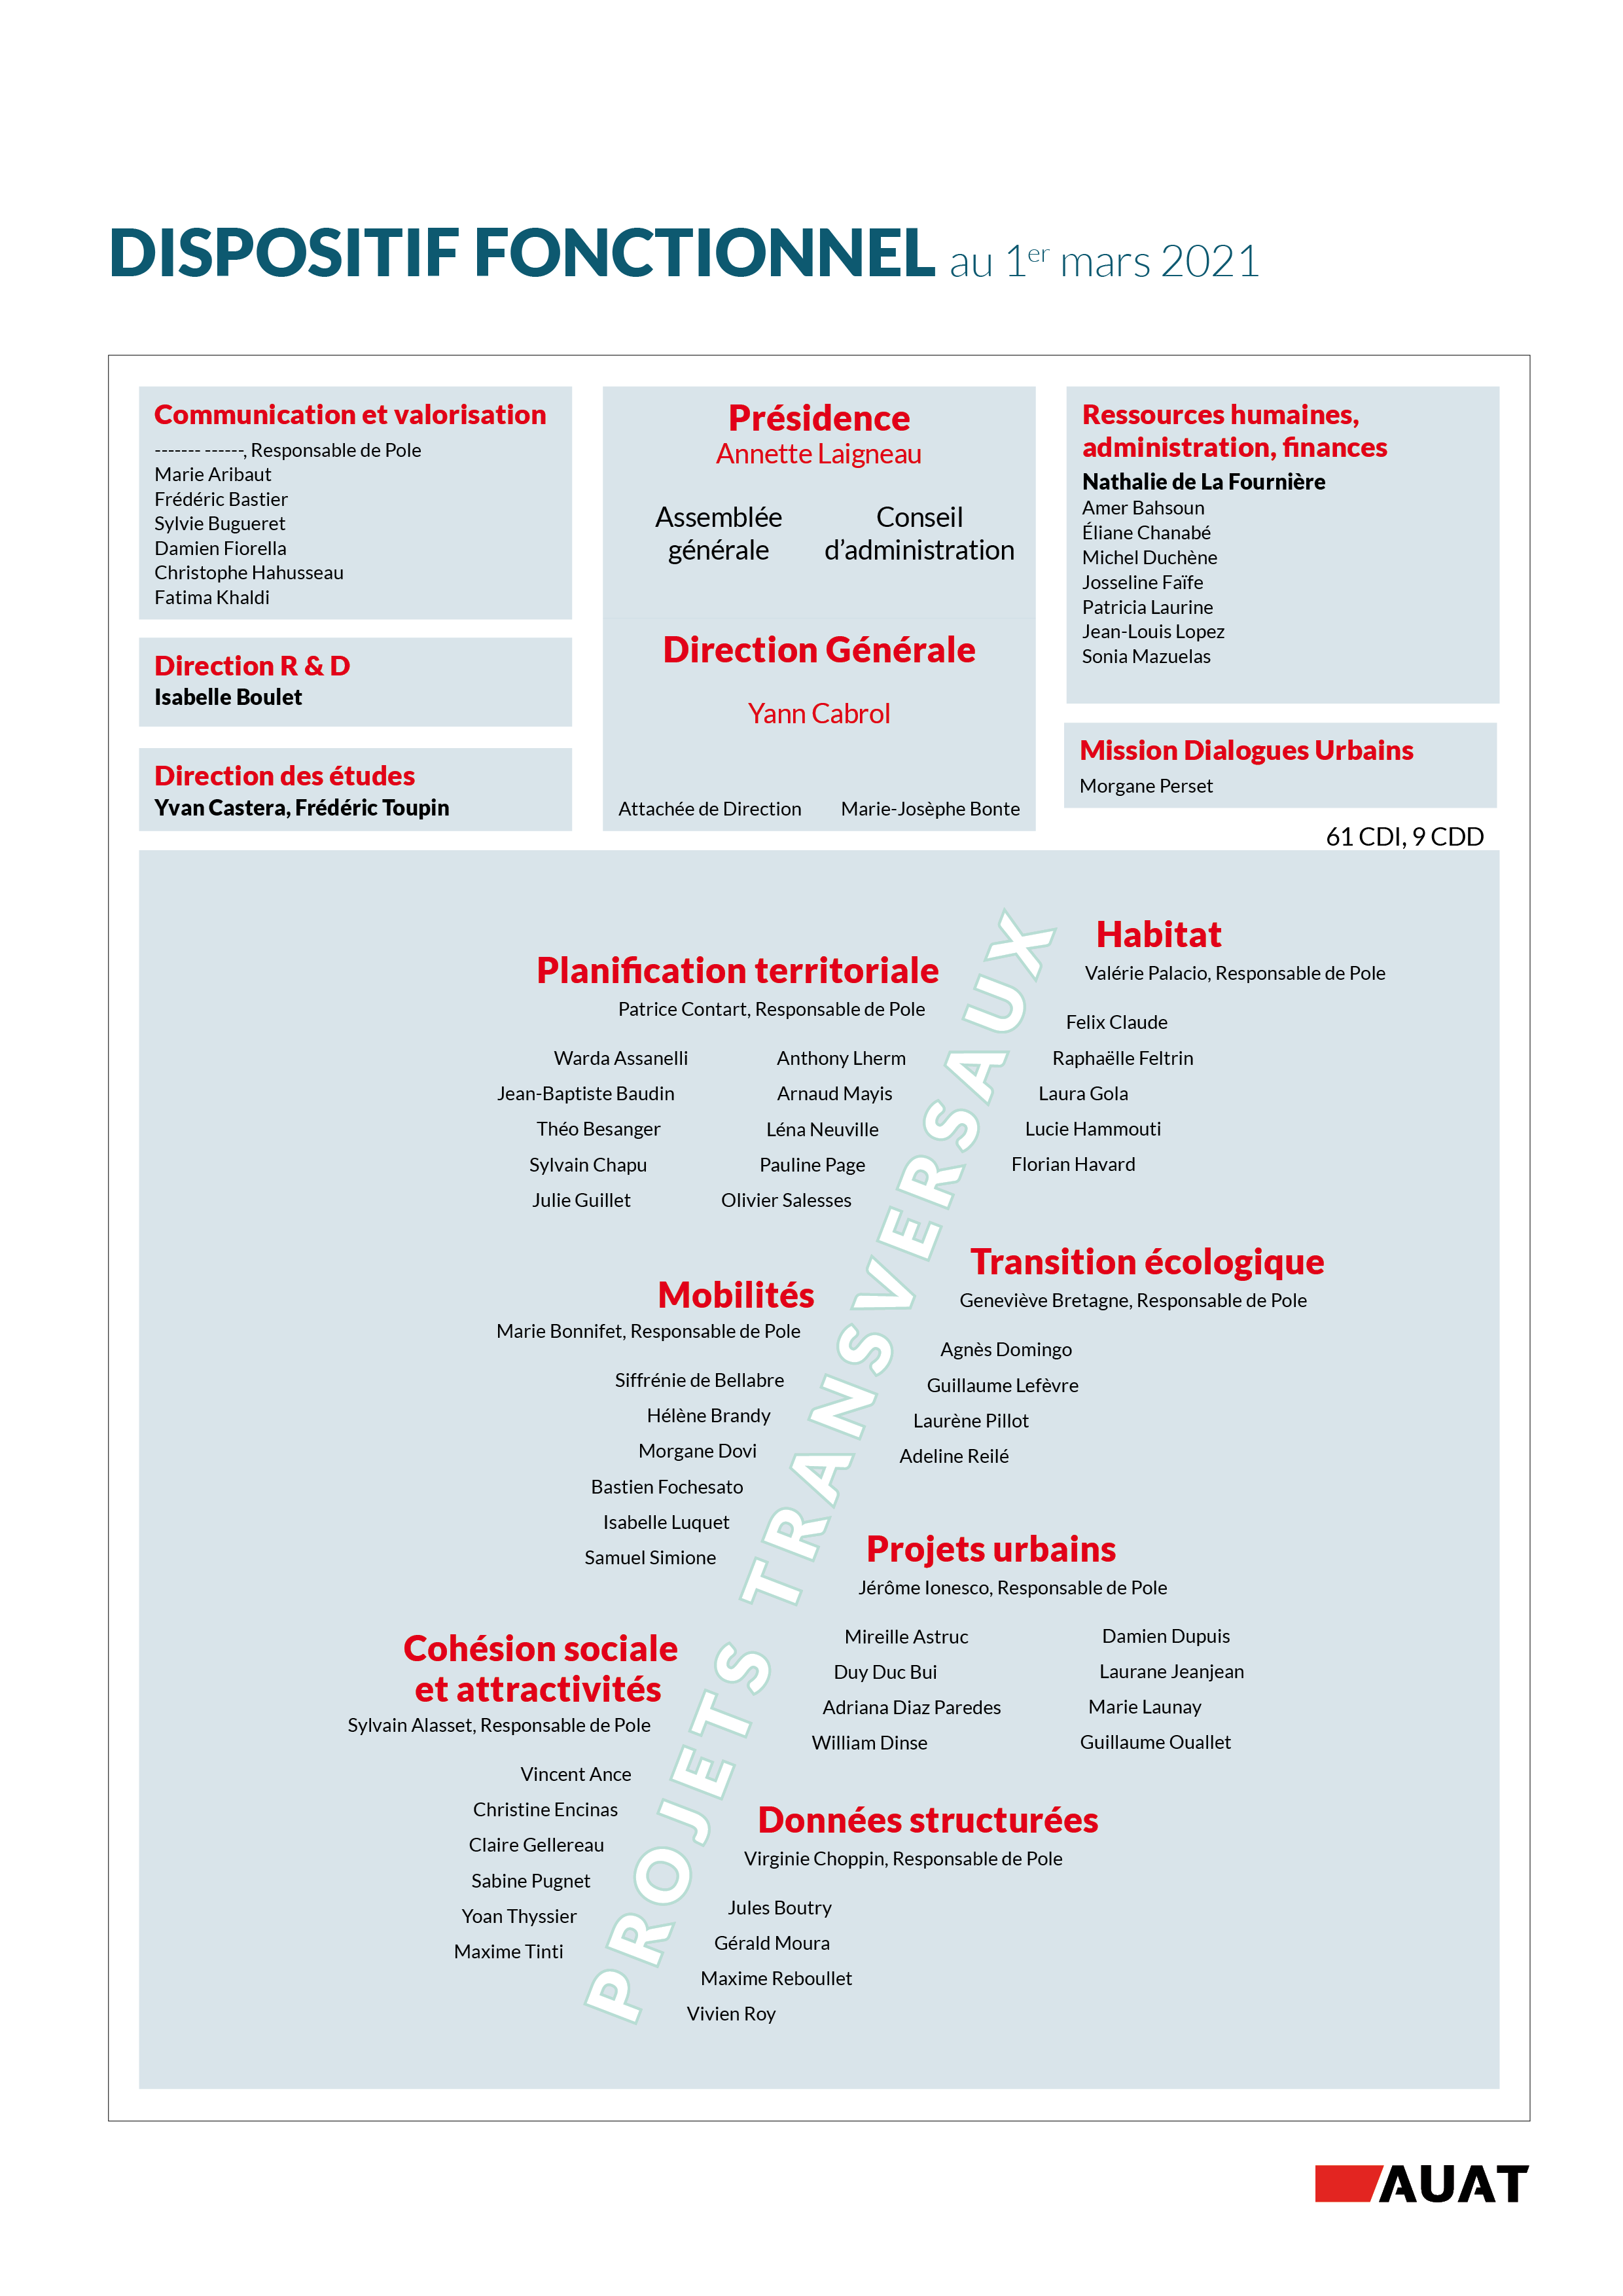 DispositifFonctionnel-mars-2021